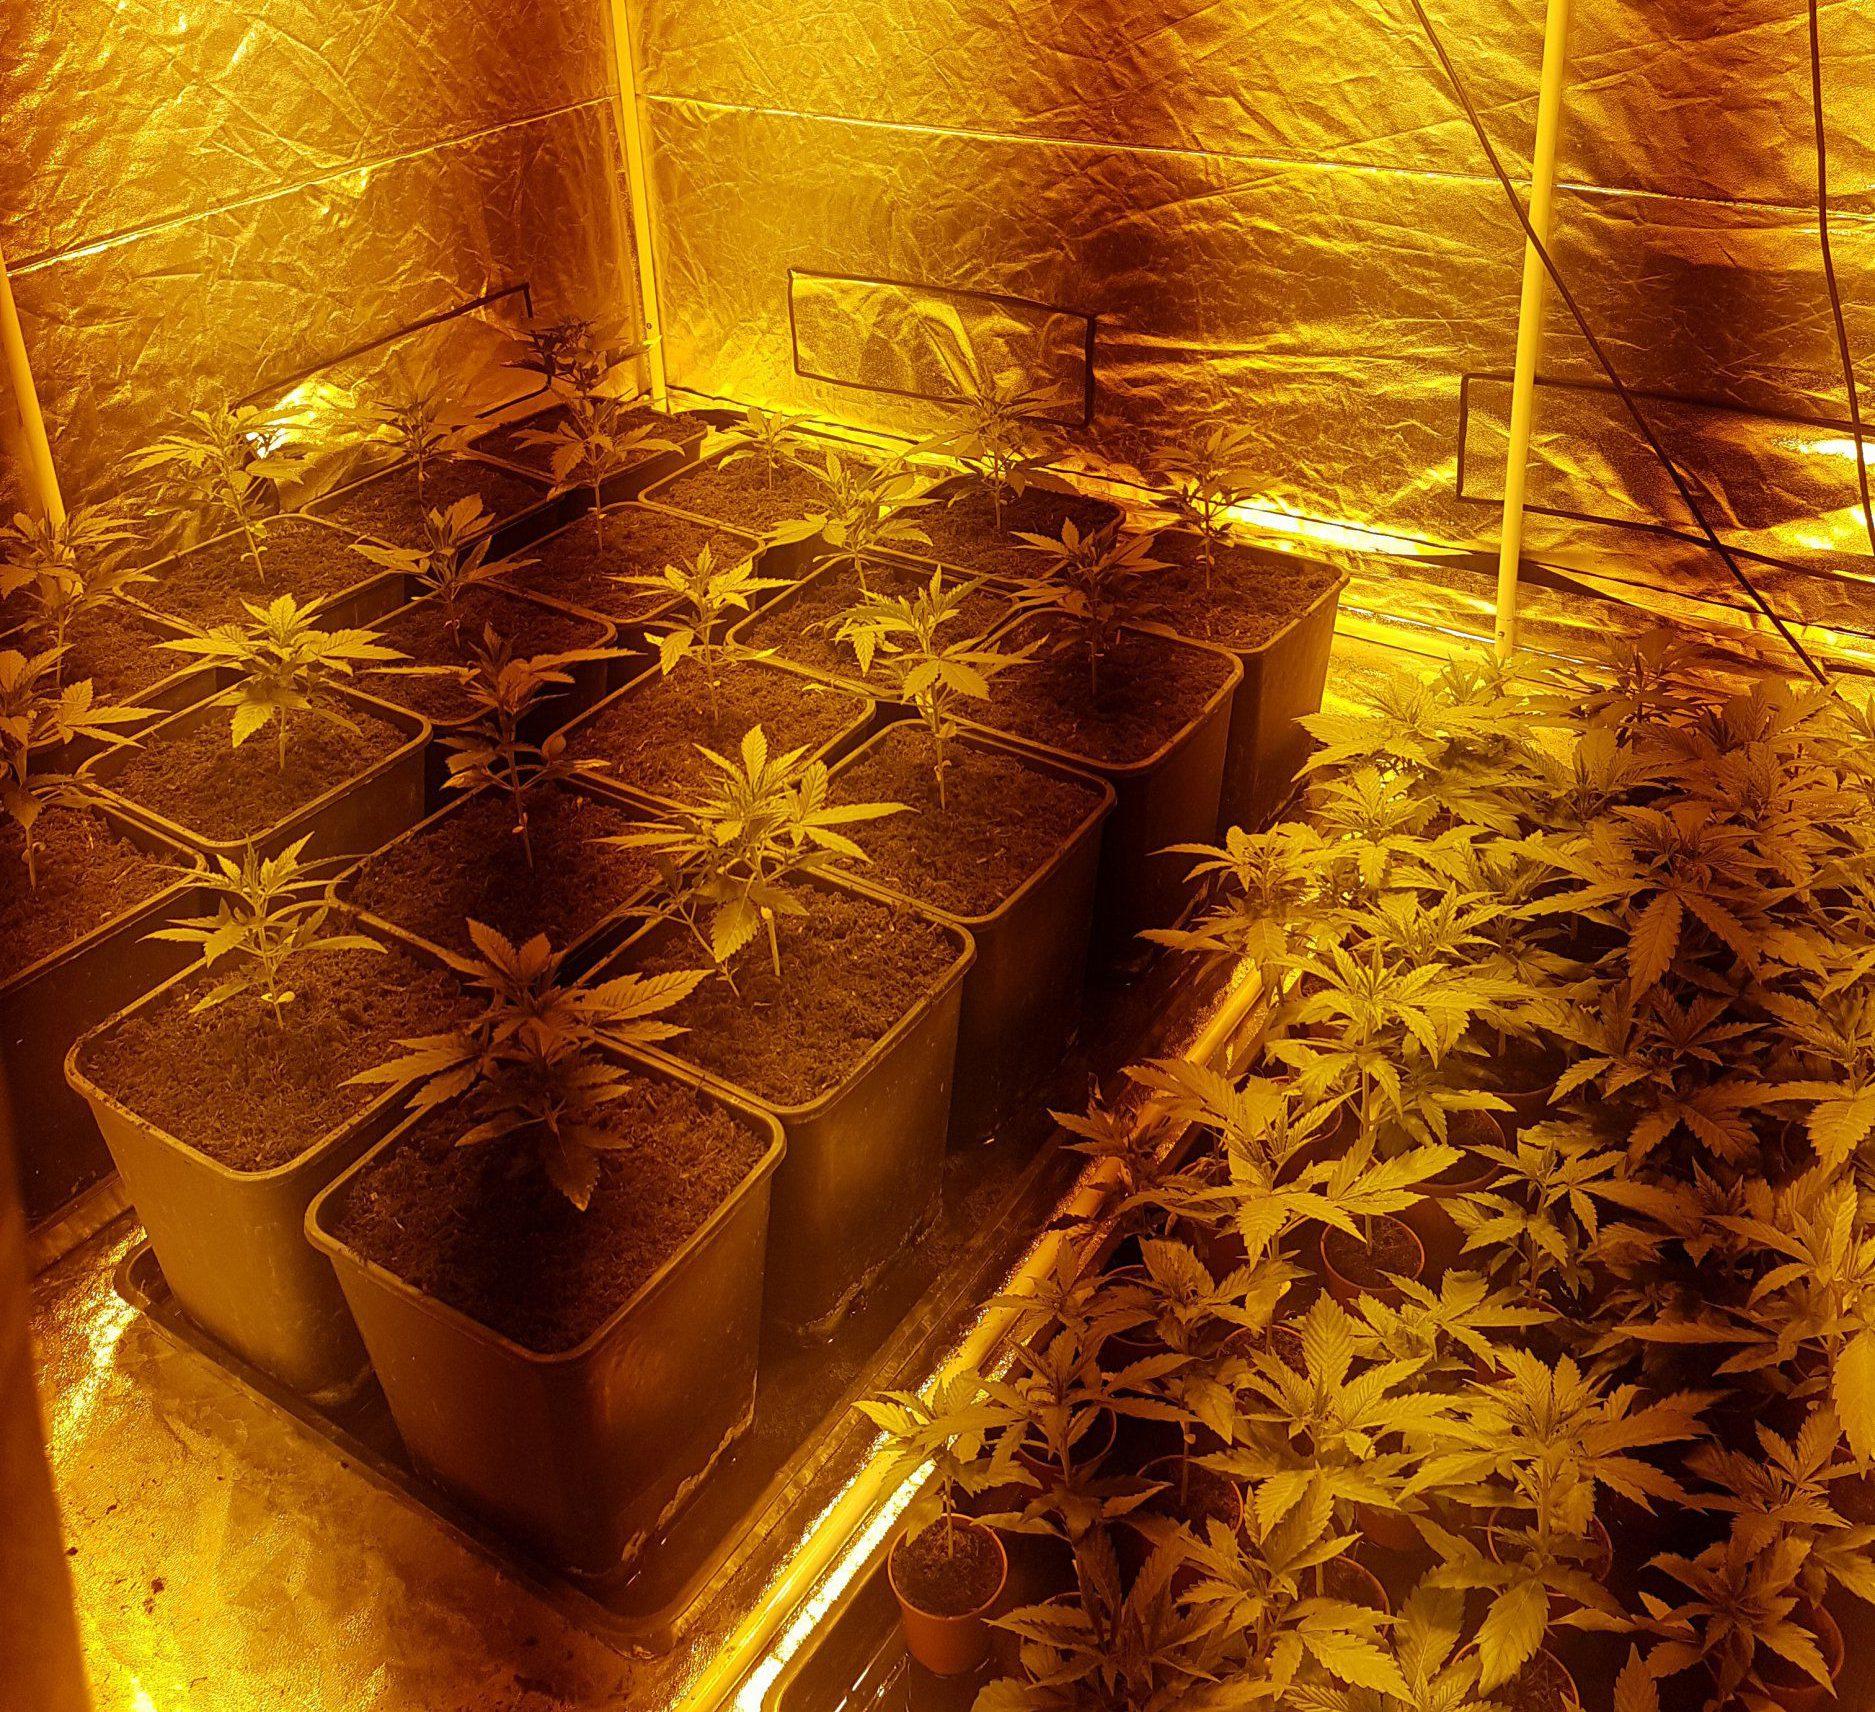 secret cannabis farm found when workers went to check fuse box Fuse Box School